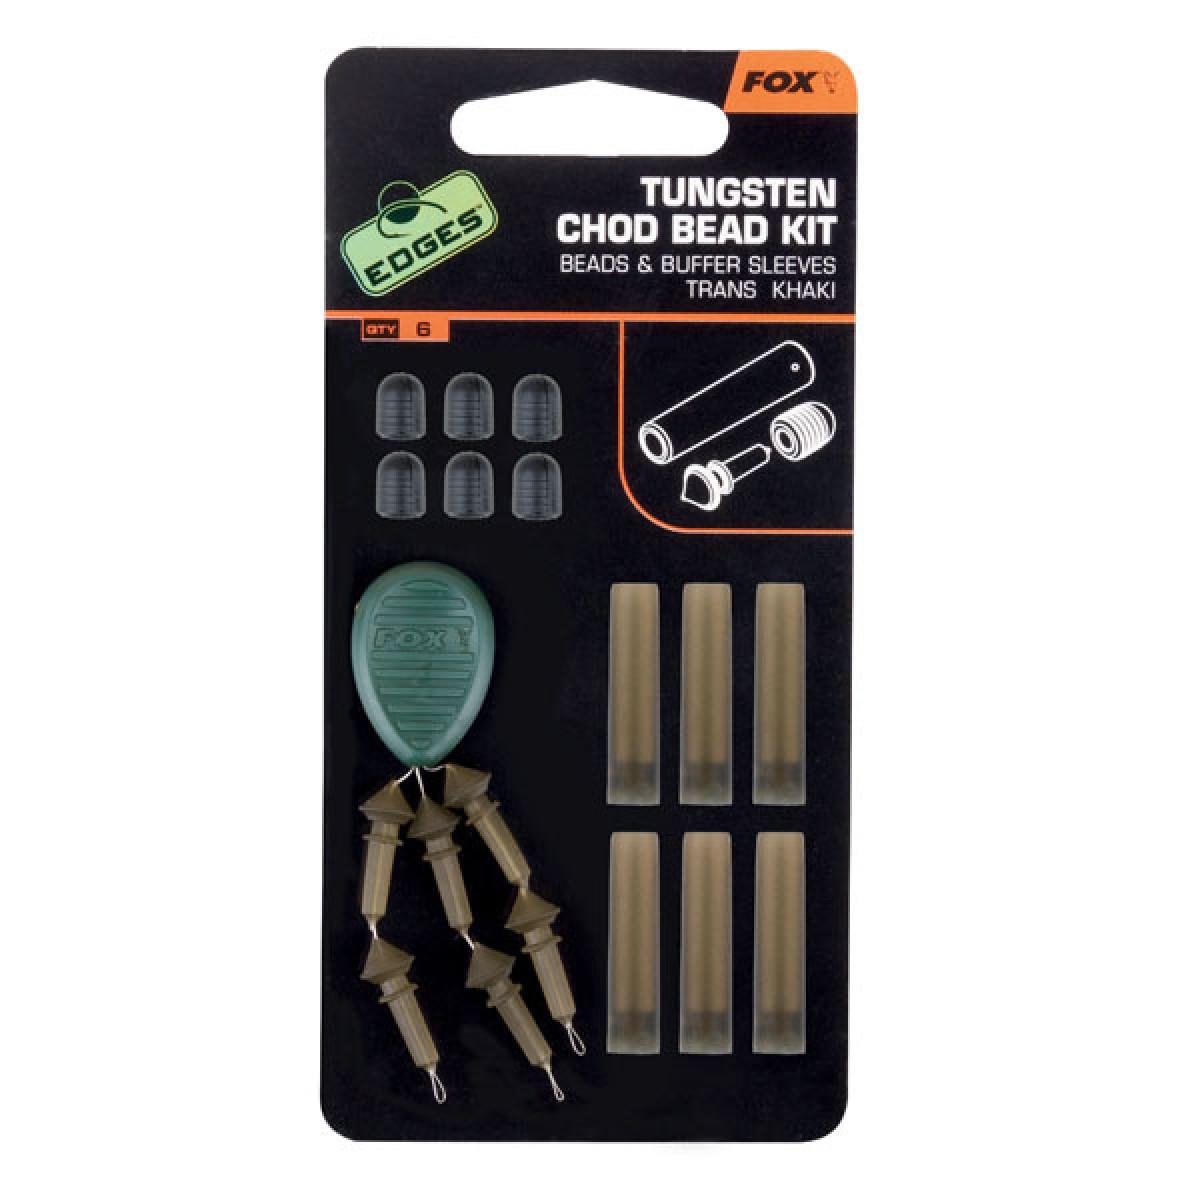 Tungsten Chod Bead Kit